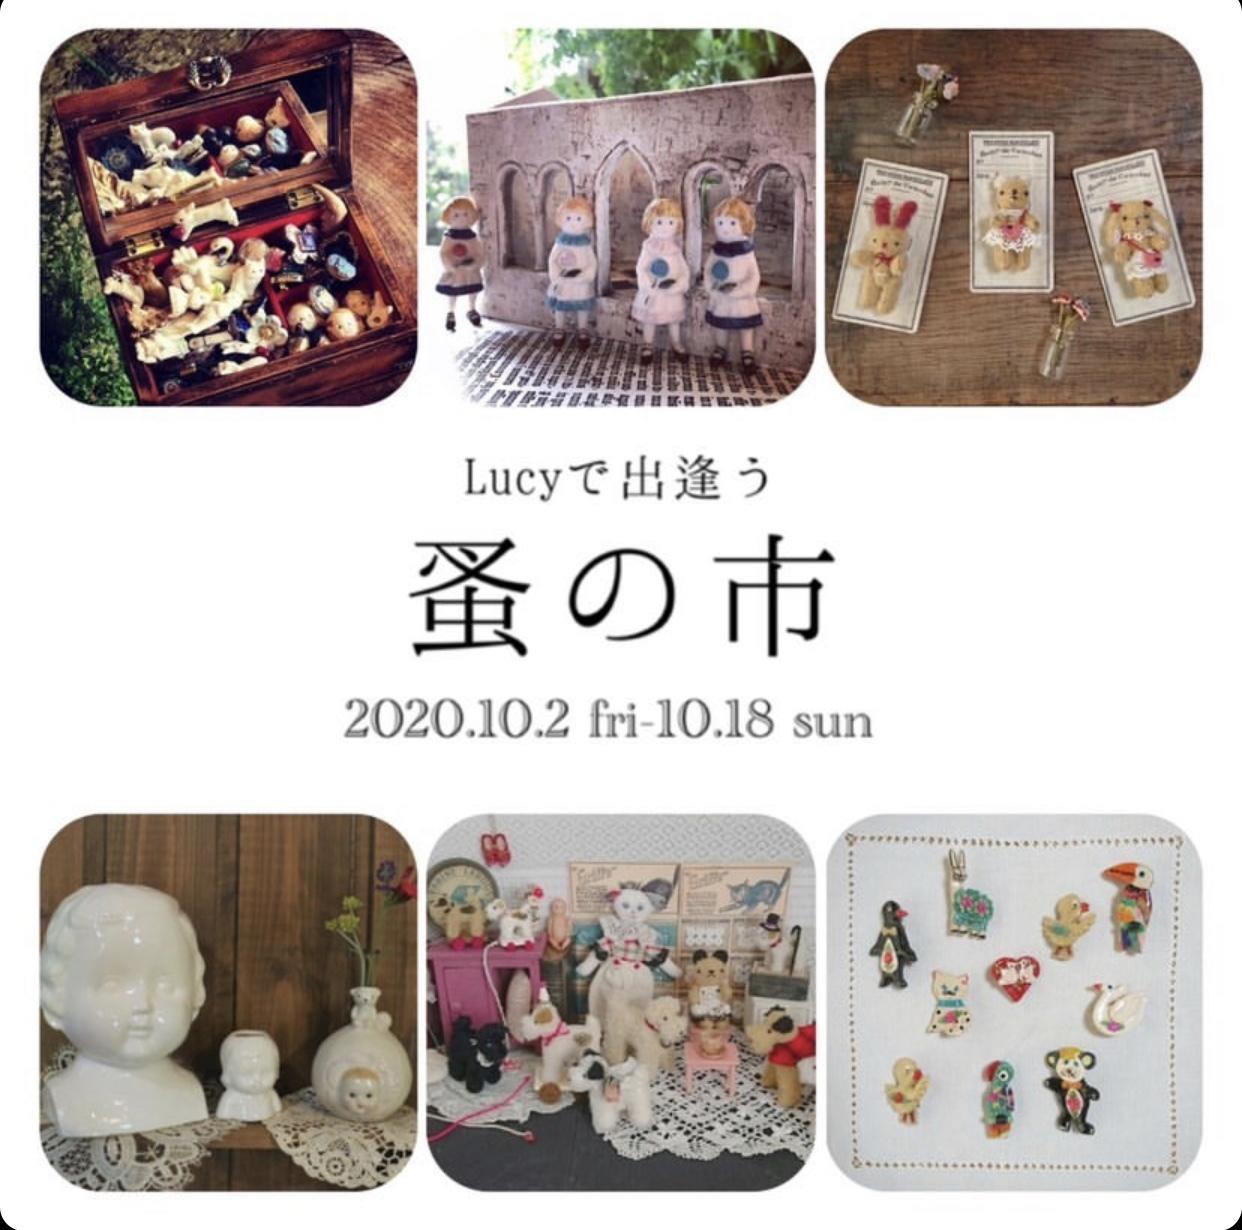 「Lucyで出逢う蚤の市」 10/2 Fri-10/18 Sun @学芸大学Lucy-secretcloset-_a0137727_15323392.jpeg